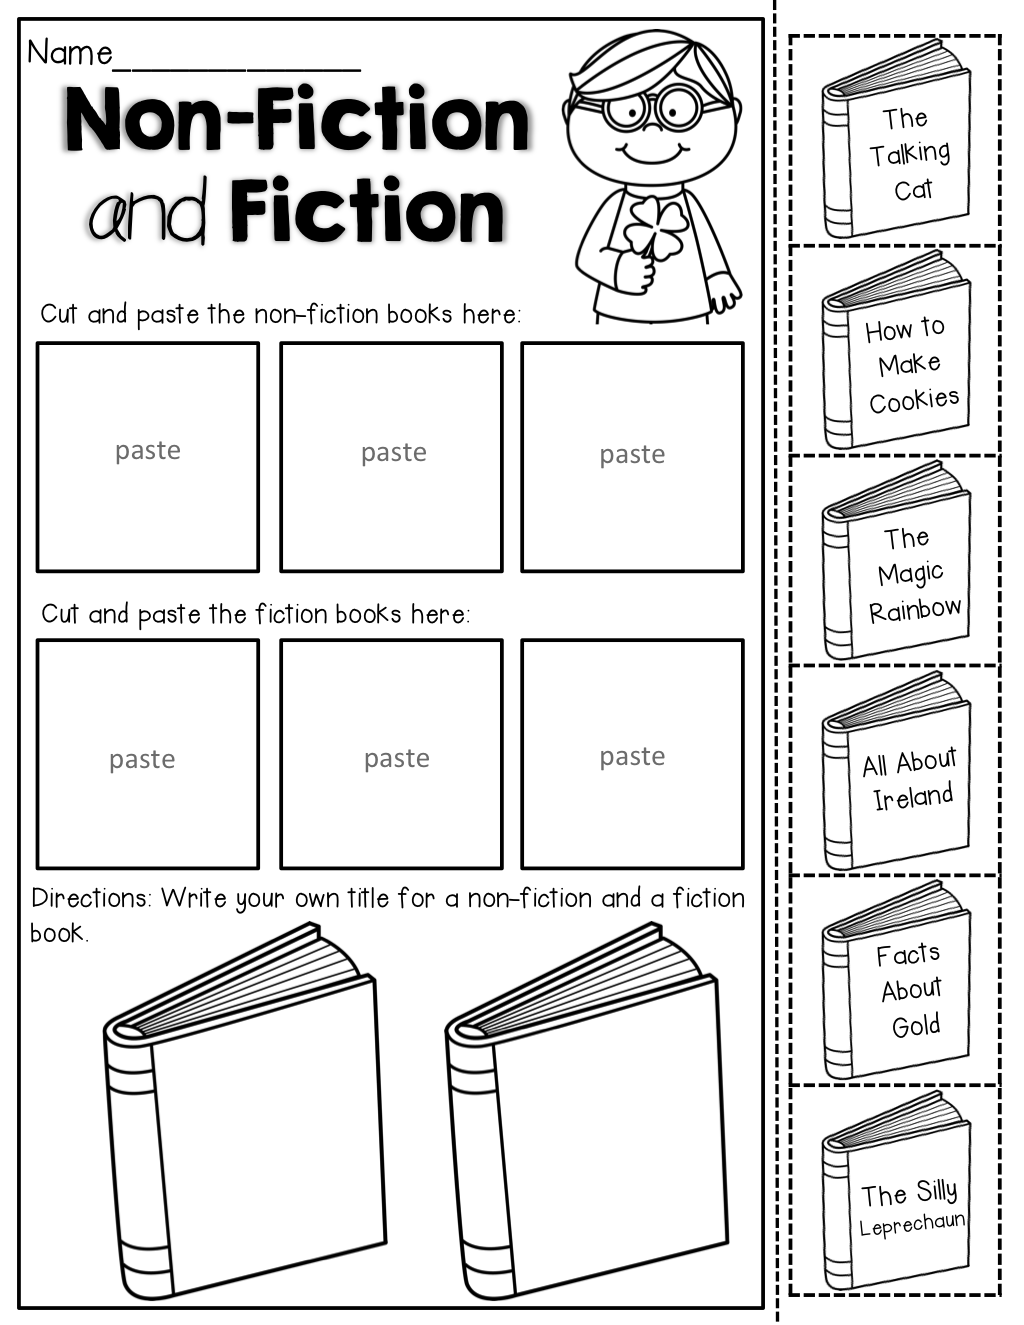 small resolution of https://dubaikhalifas.com/class-visit-worksheet-fiction-vs-non-fiction/